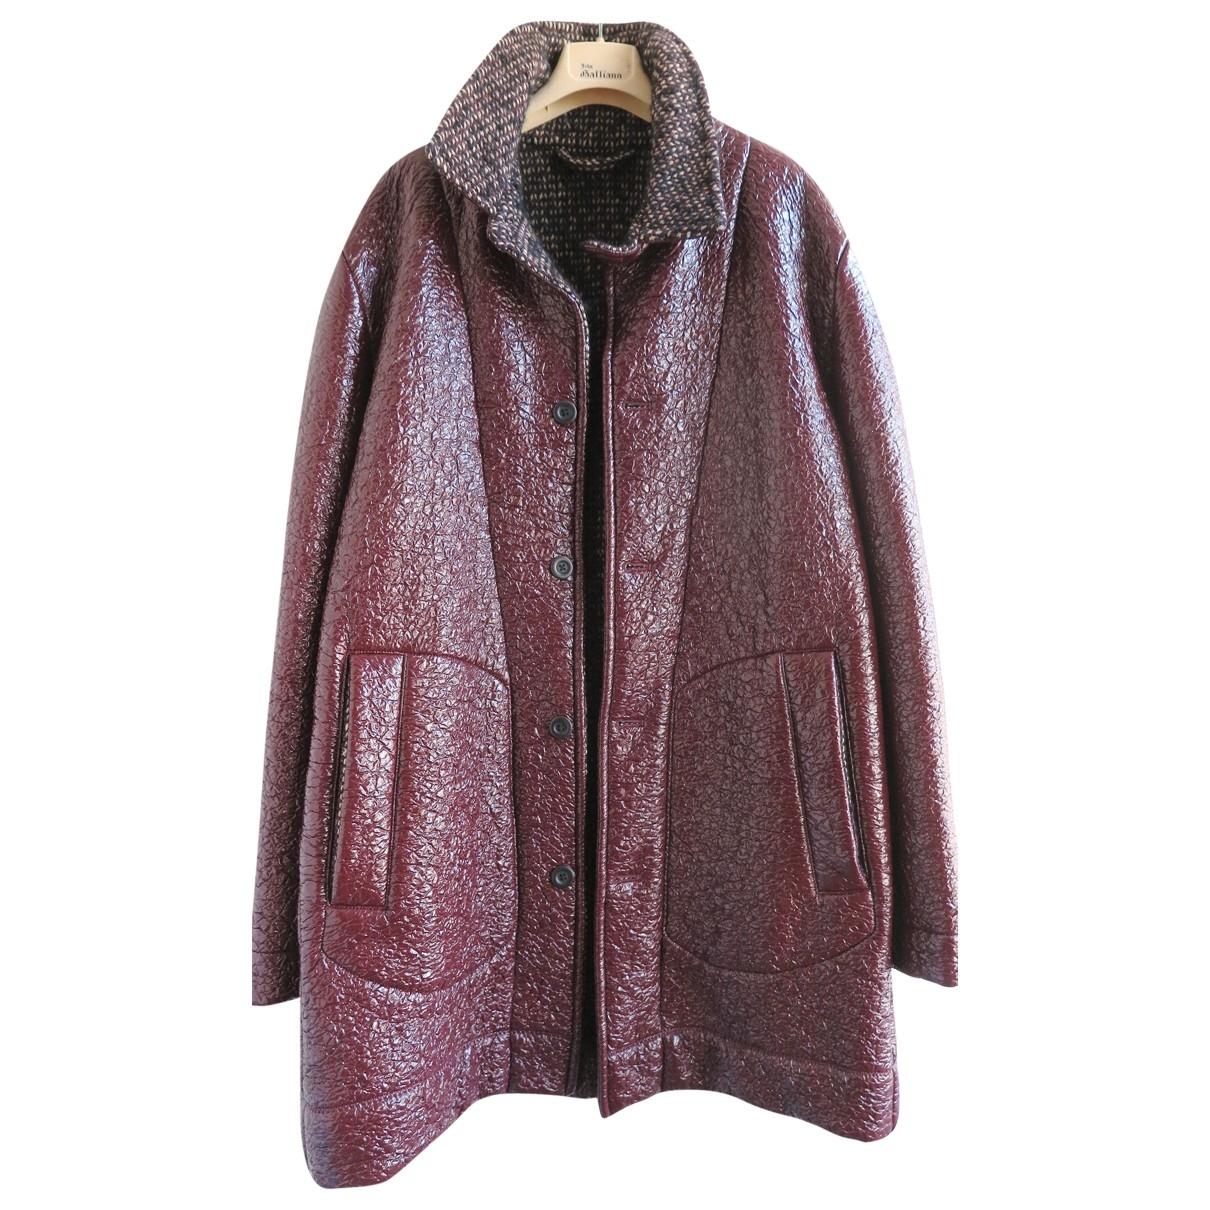 Bottega Veneta \N Burgundy Wool coat  for Men 48 IT